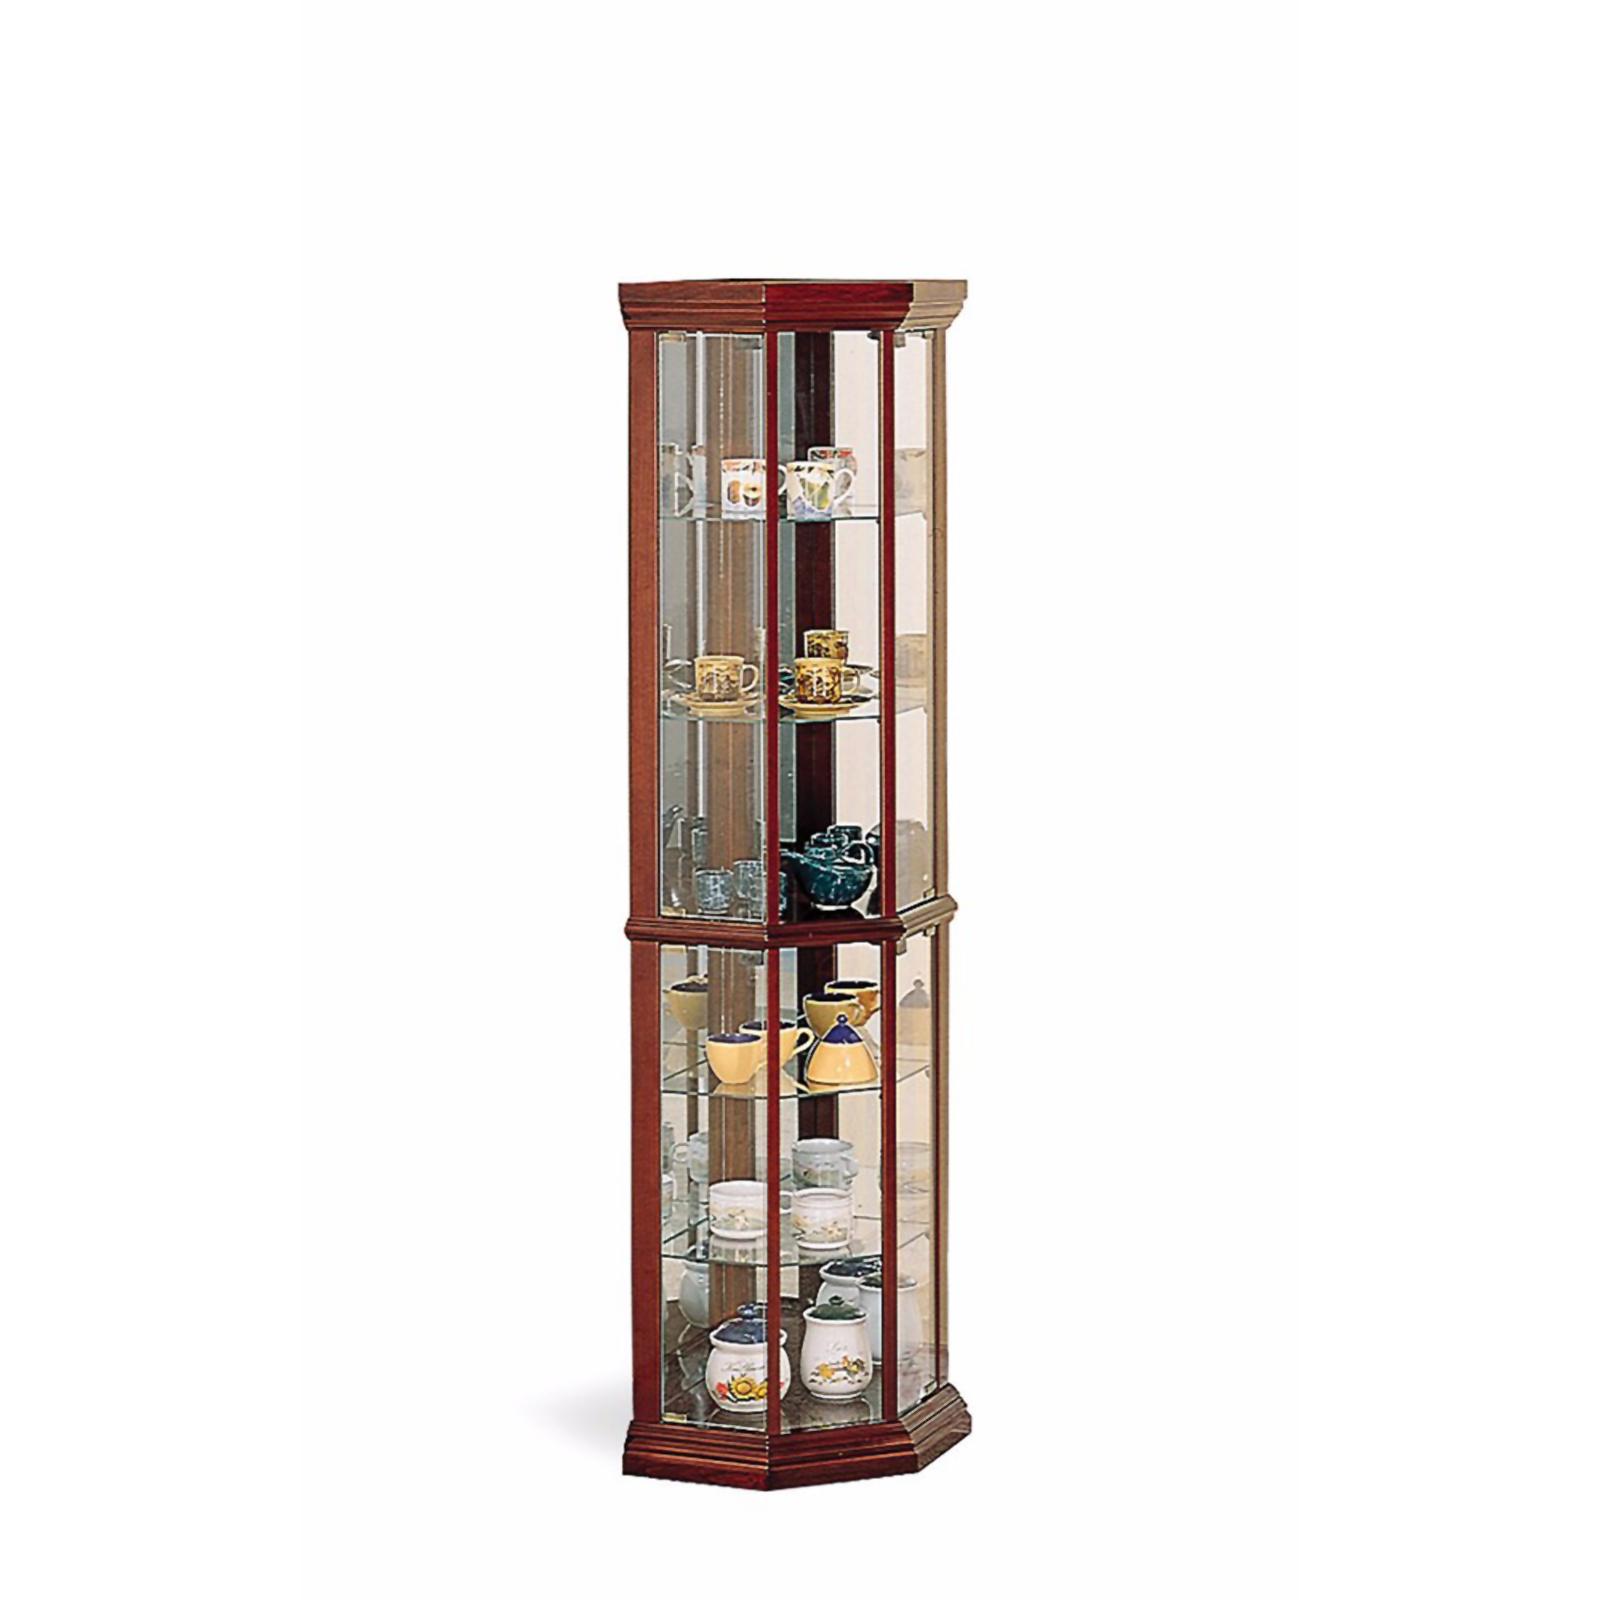 Coaster Solid Wood Glass Corner China Curio Cabinet, Cherry Finish